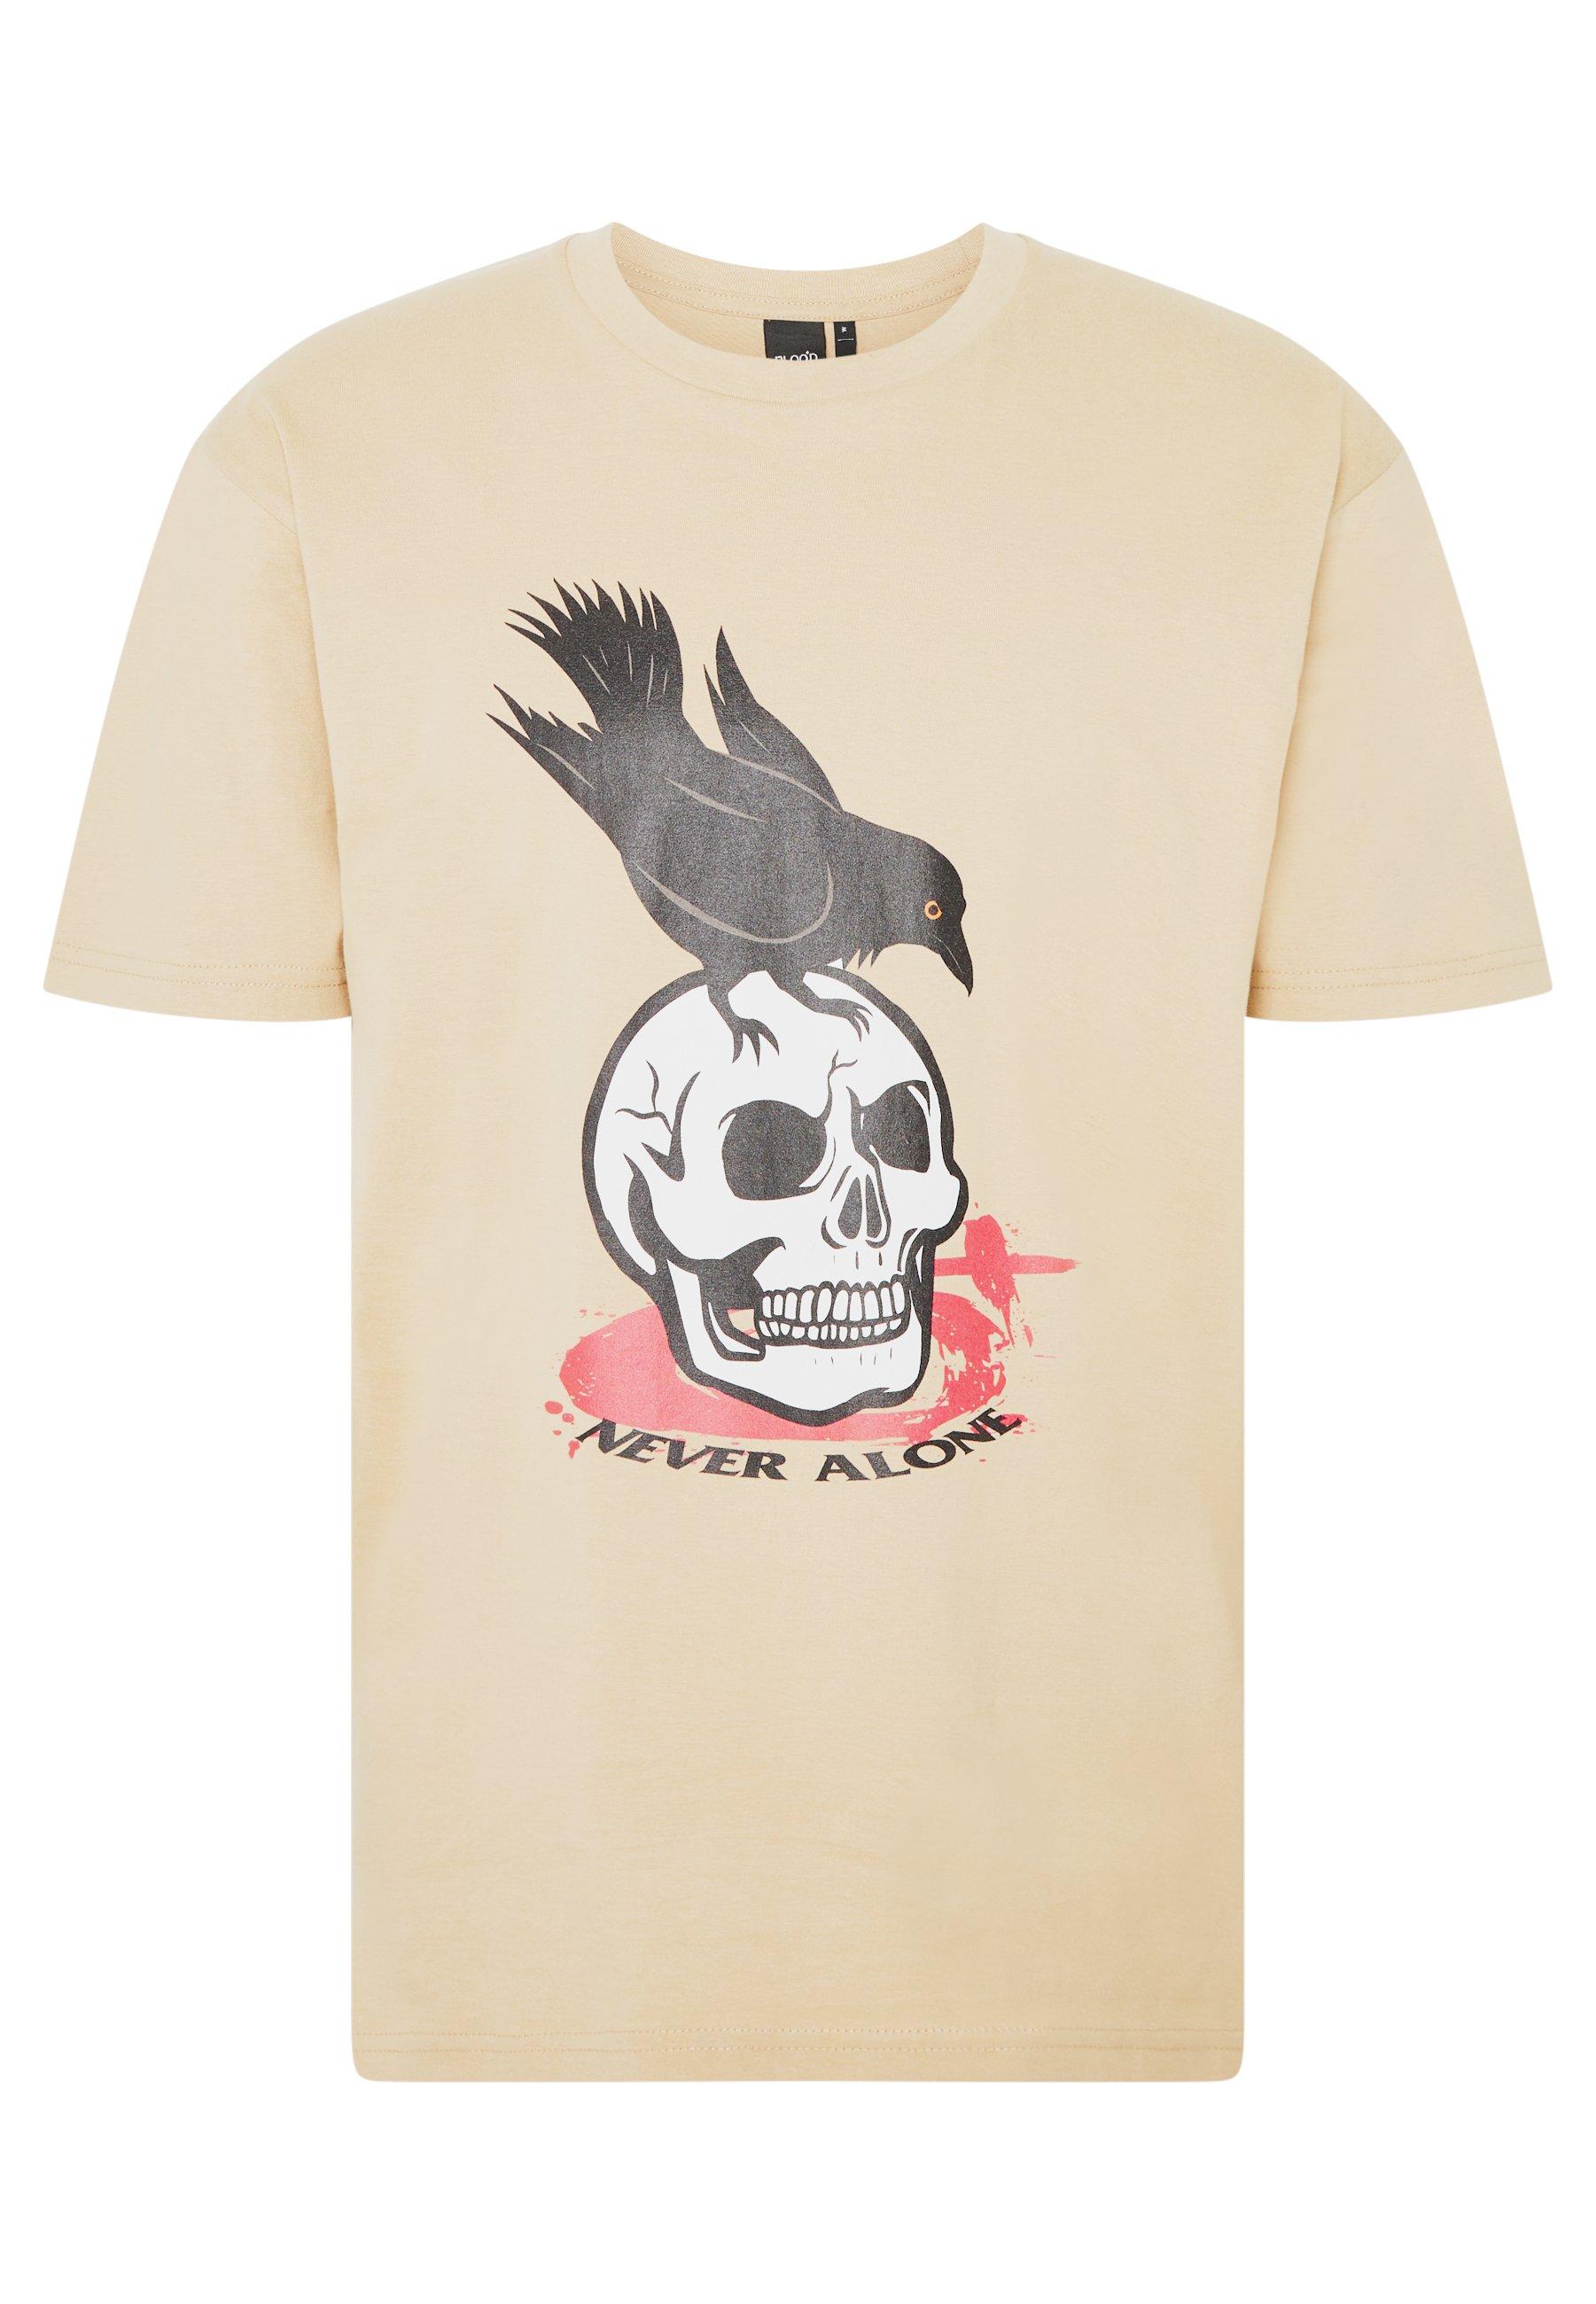 Blood Brother Print T-shirt - tan